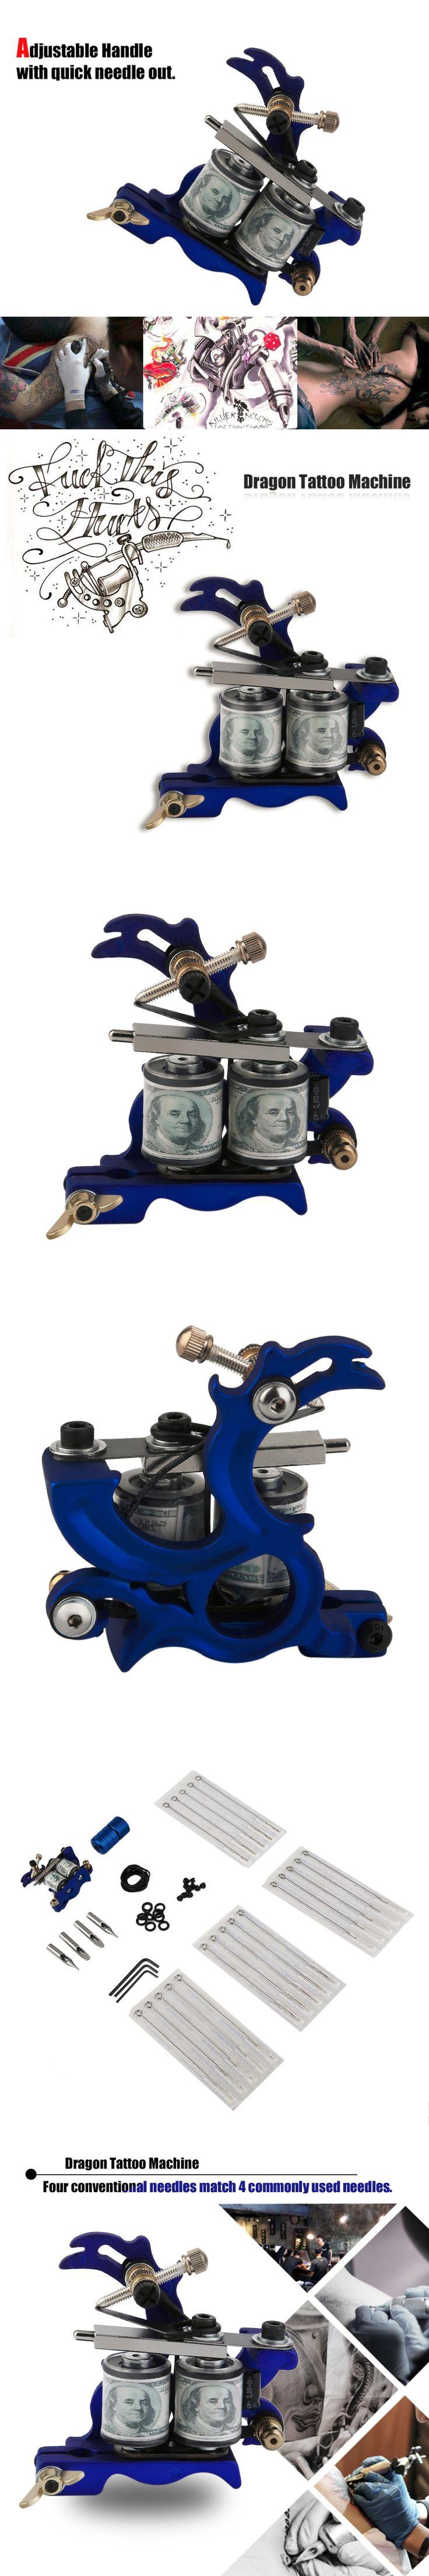 Primus Rotary Tattoo Machine Shader Liner Gun Tattoo Gun Made Cast Iron not easy get dirty Blue Machine frame top quality